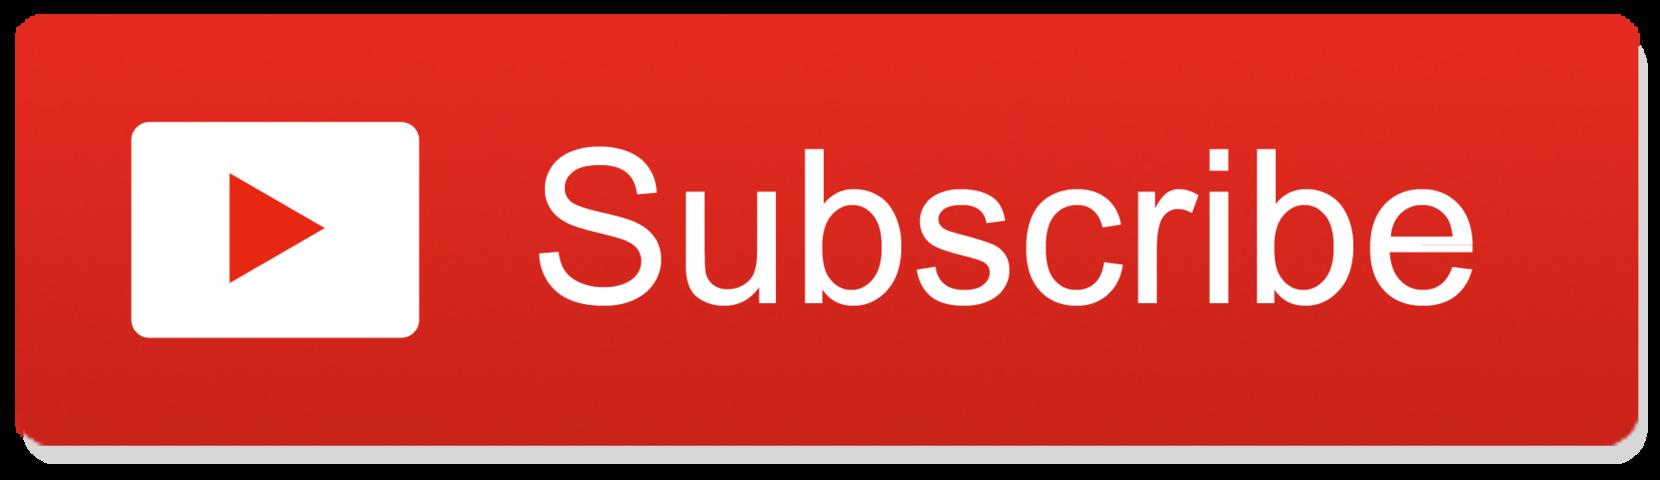 YouTube.com/ElShowDeTiburcio